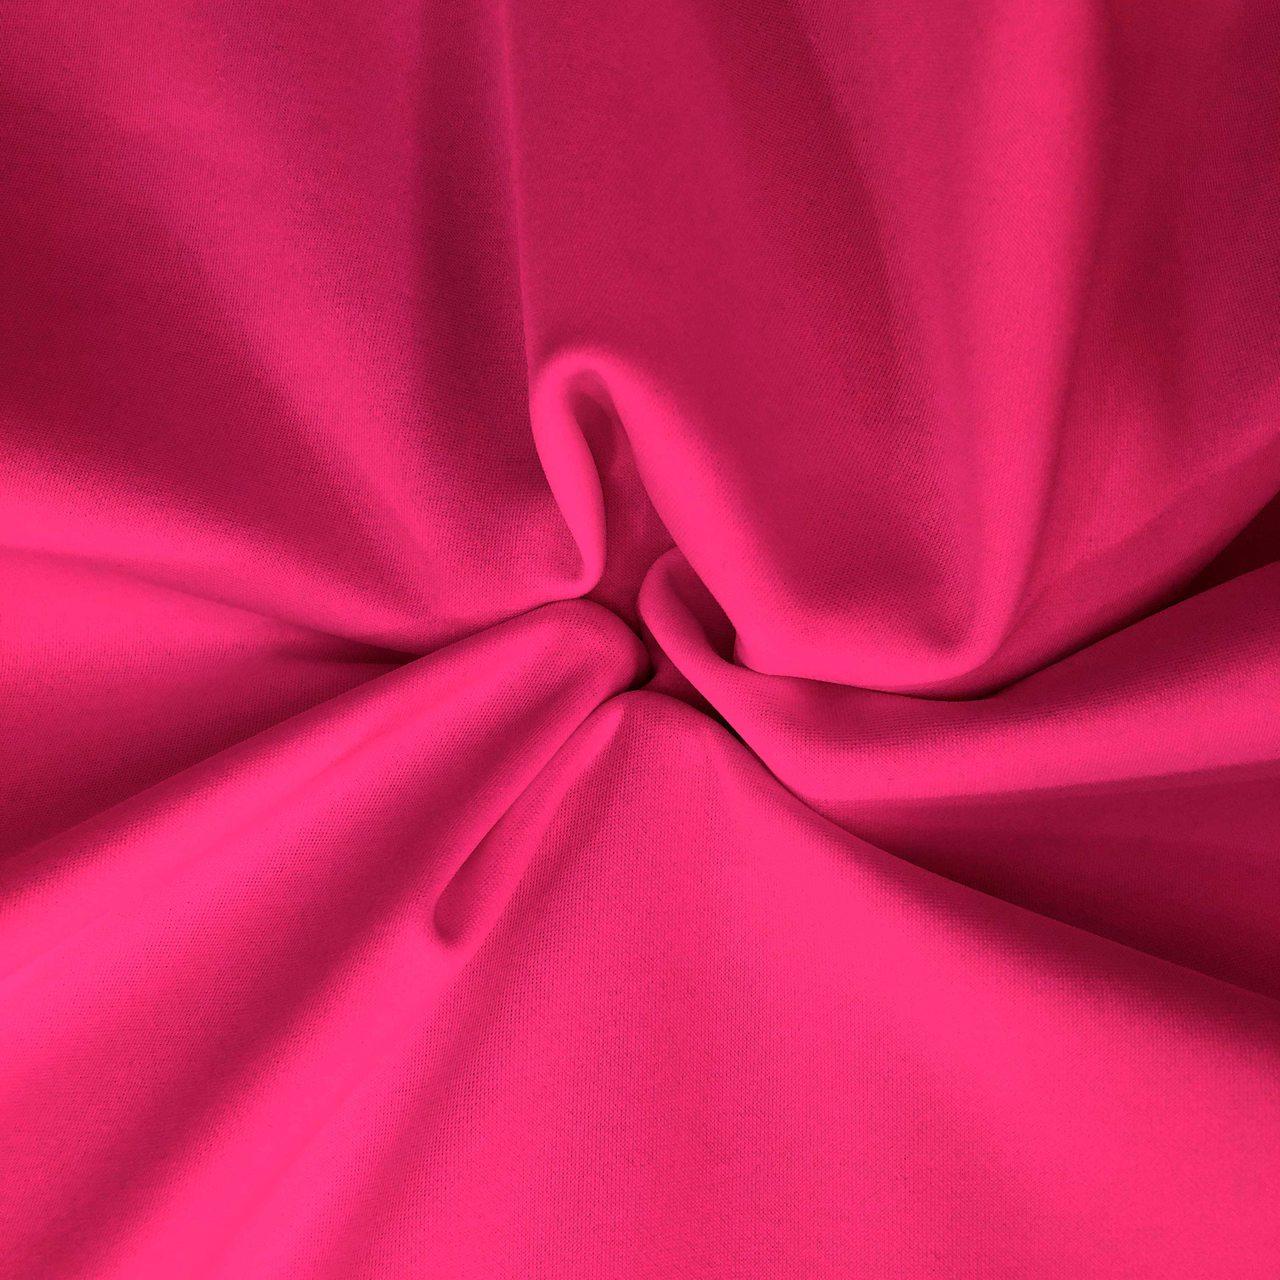 Tecido Malha Suplex 92%Poliamida 8%Elastano Pink